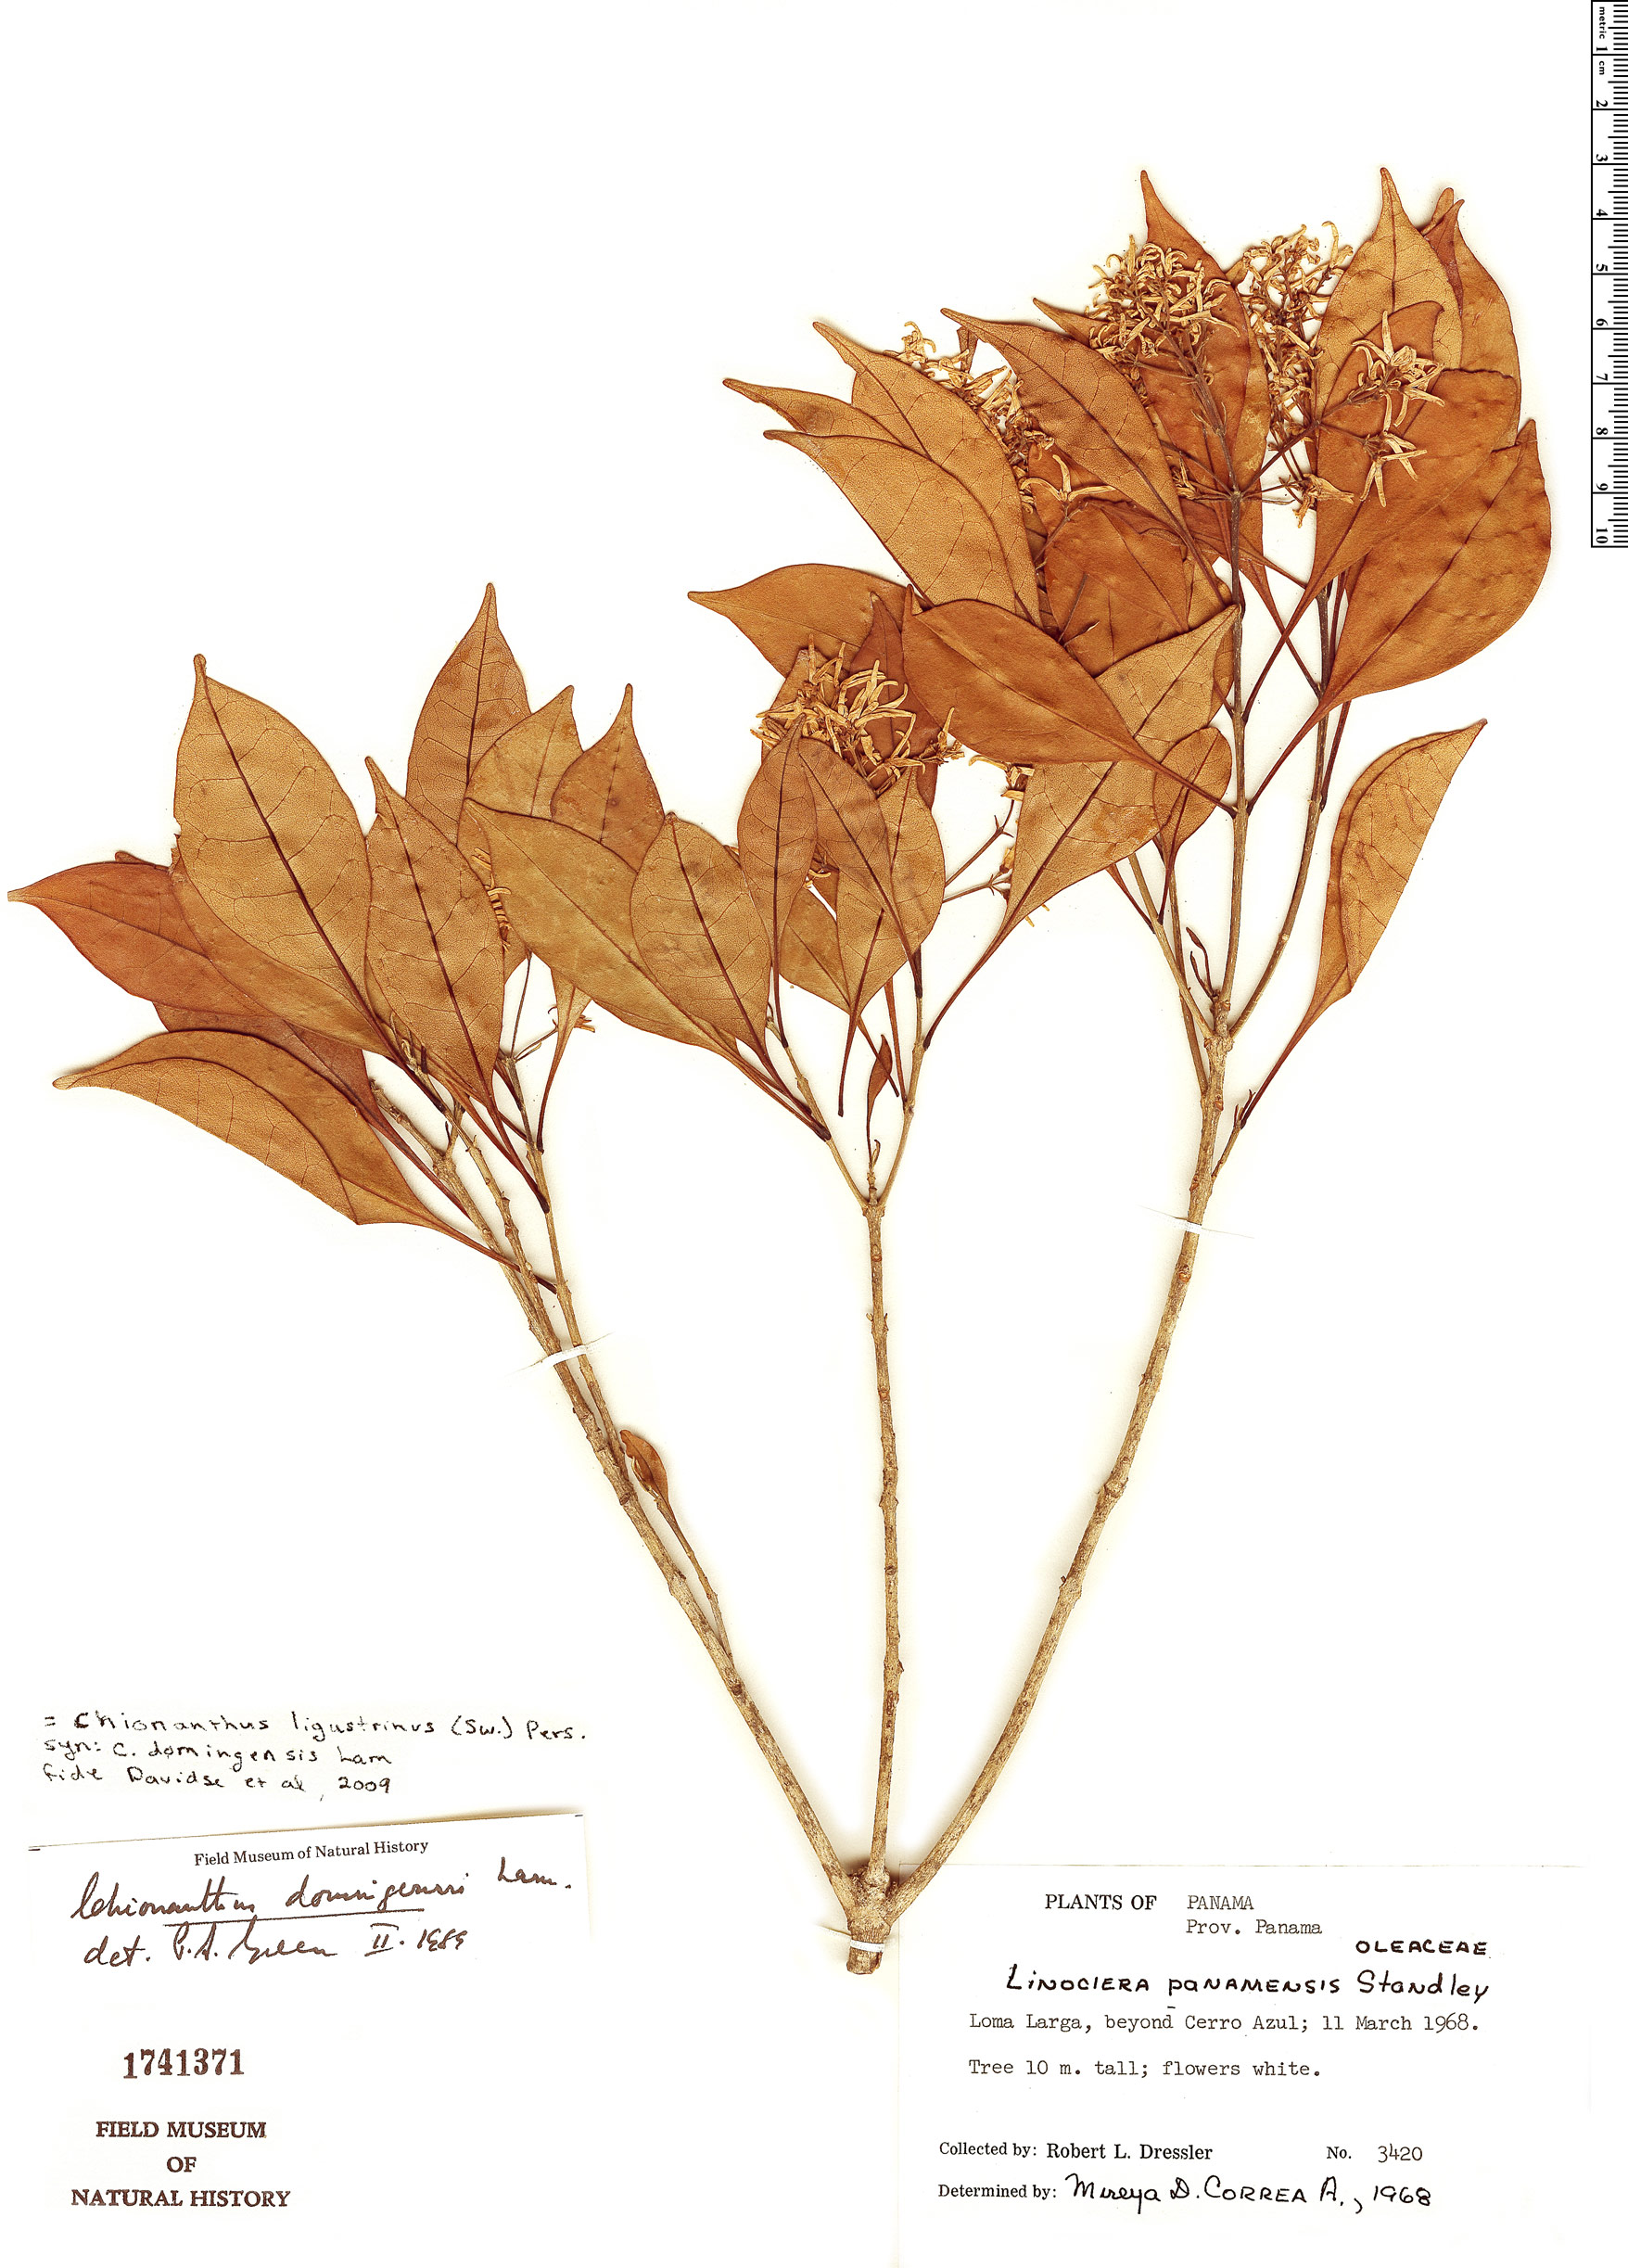 Specimen: Chionanthus panamensis